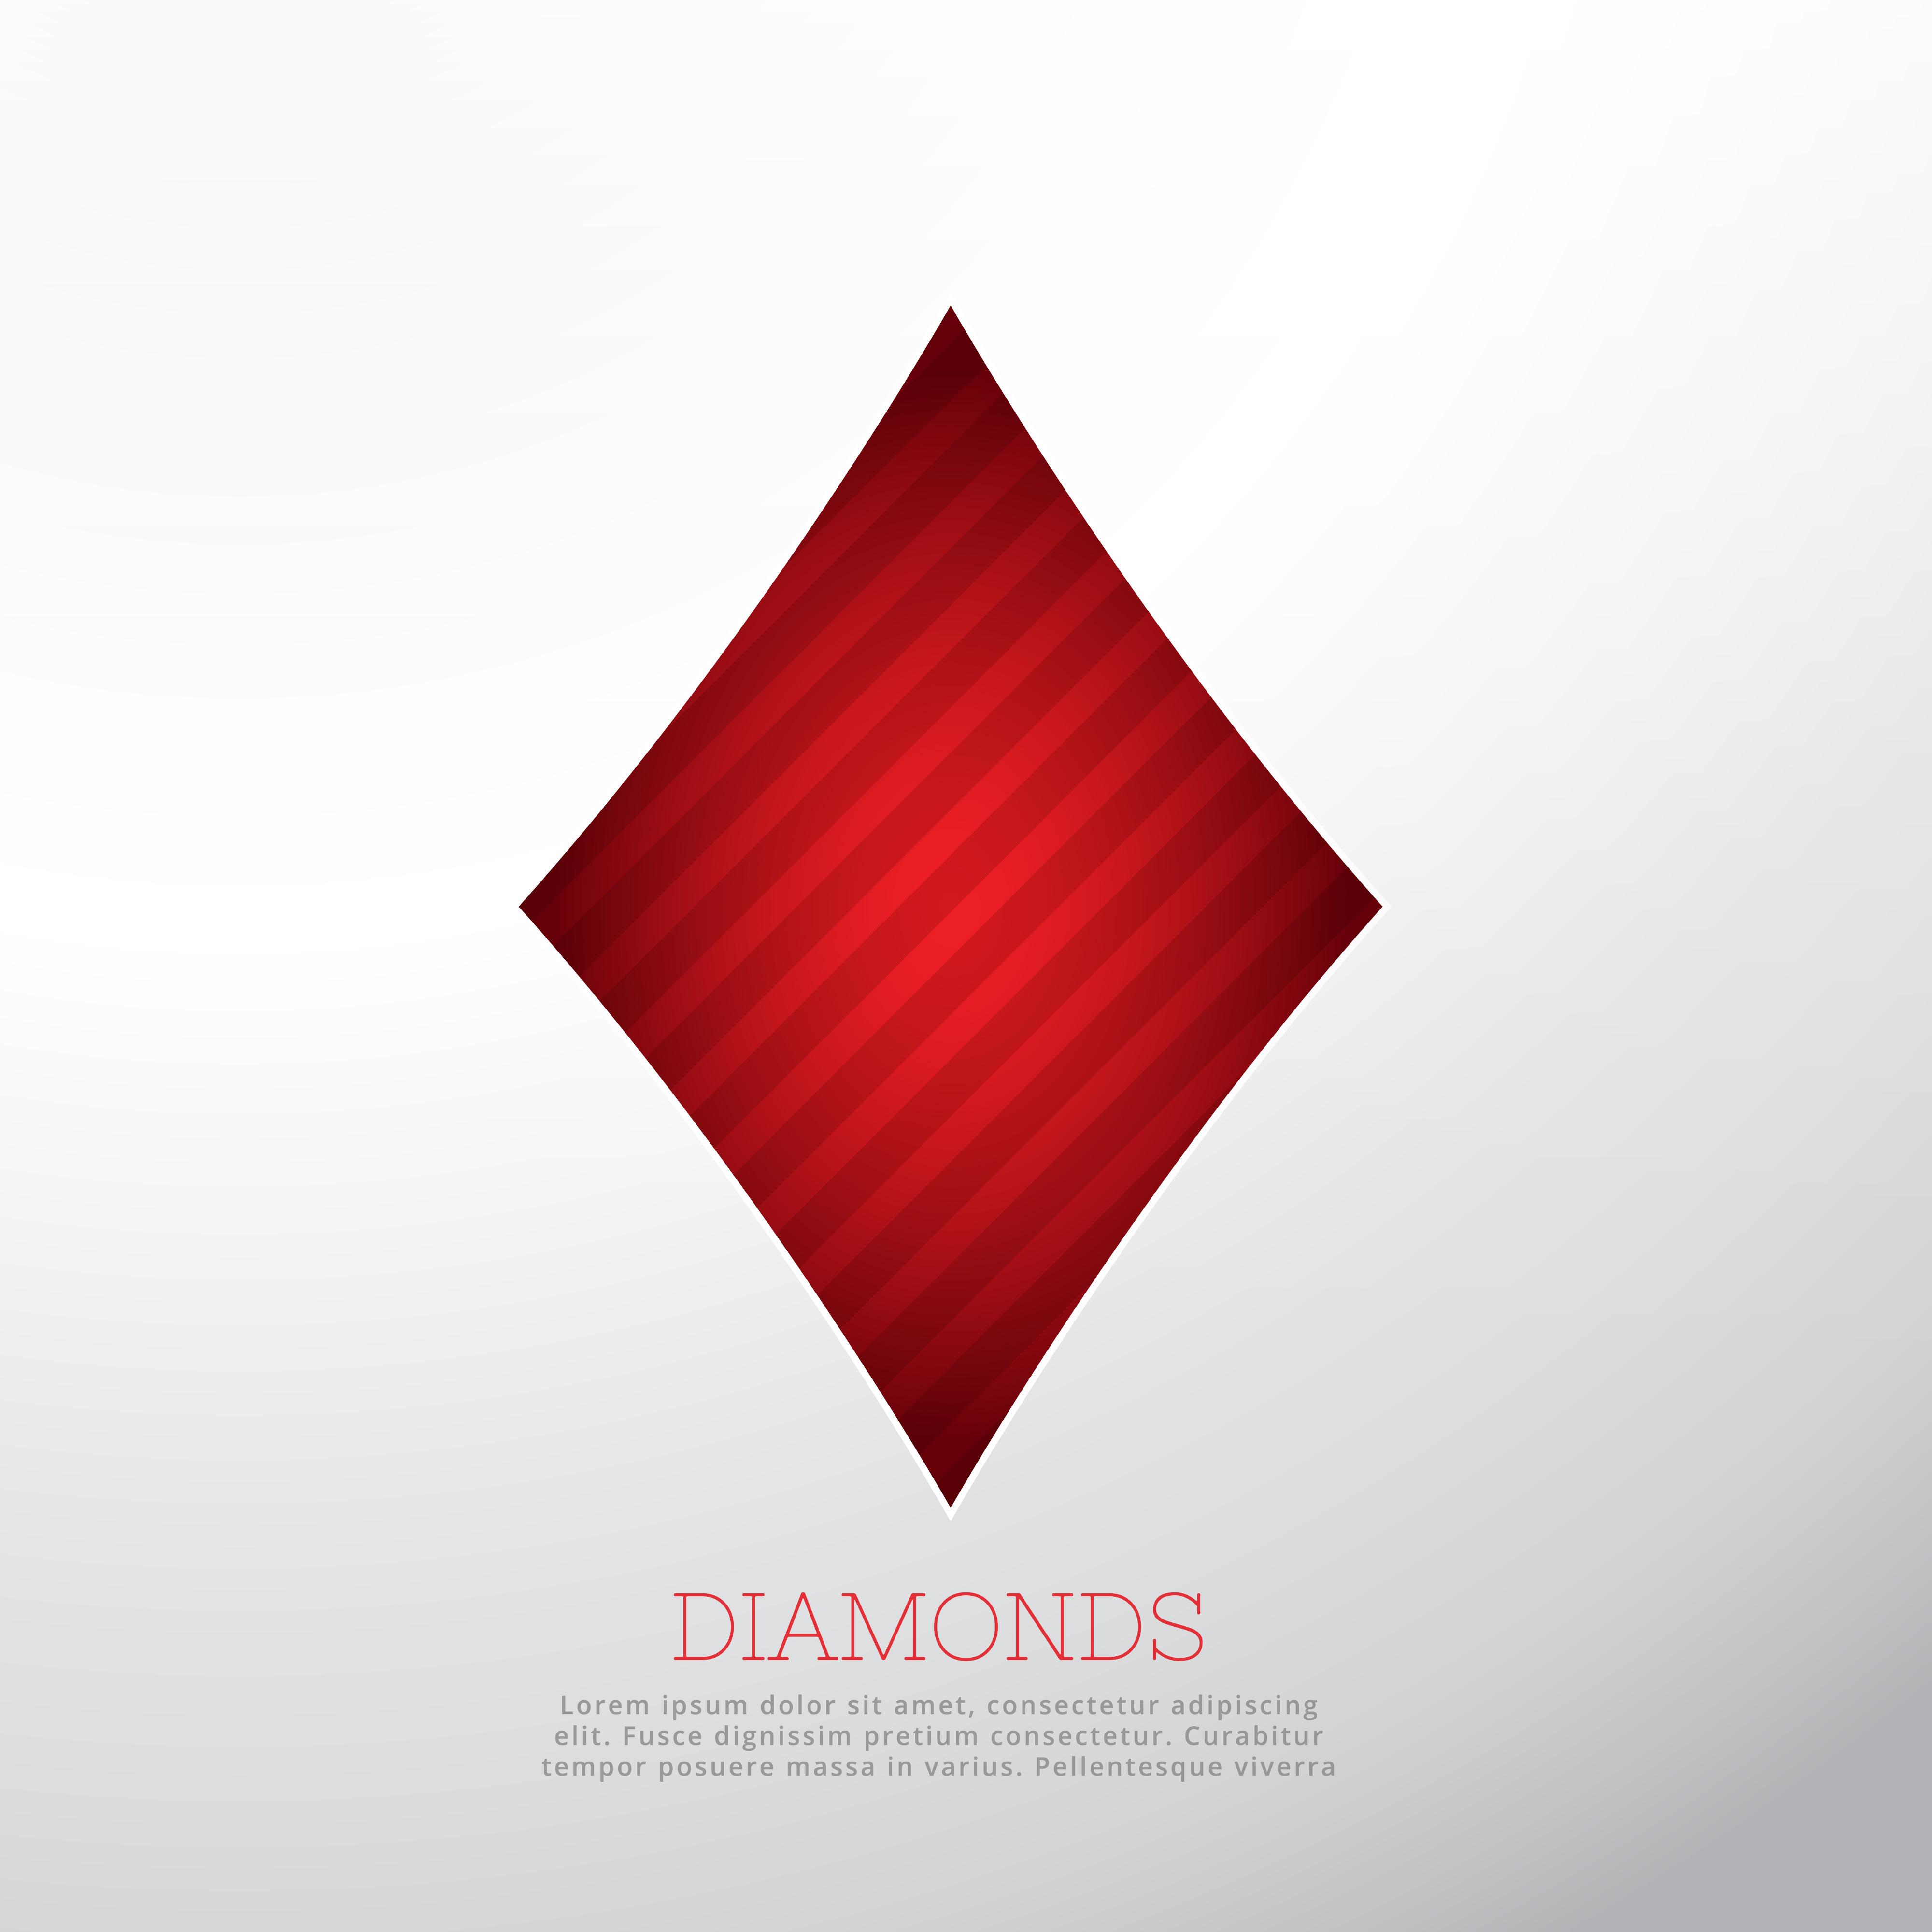 red diamond shape isolated on white background